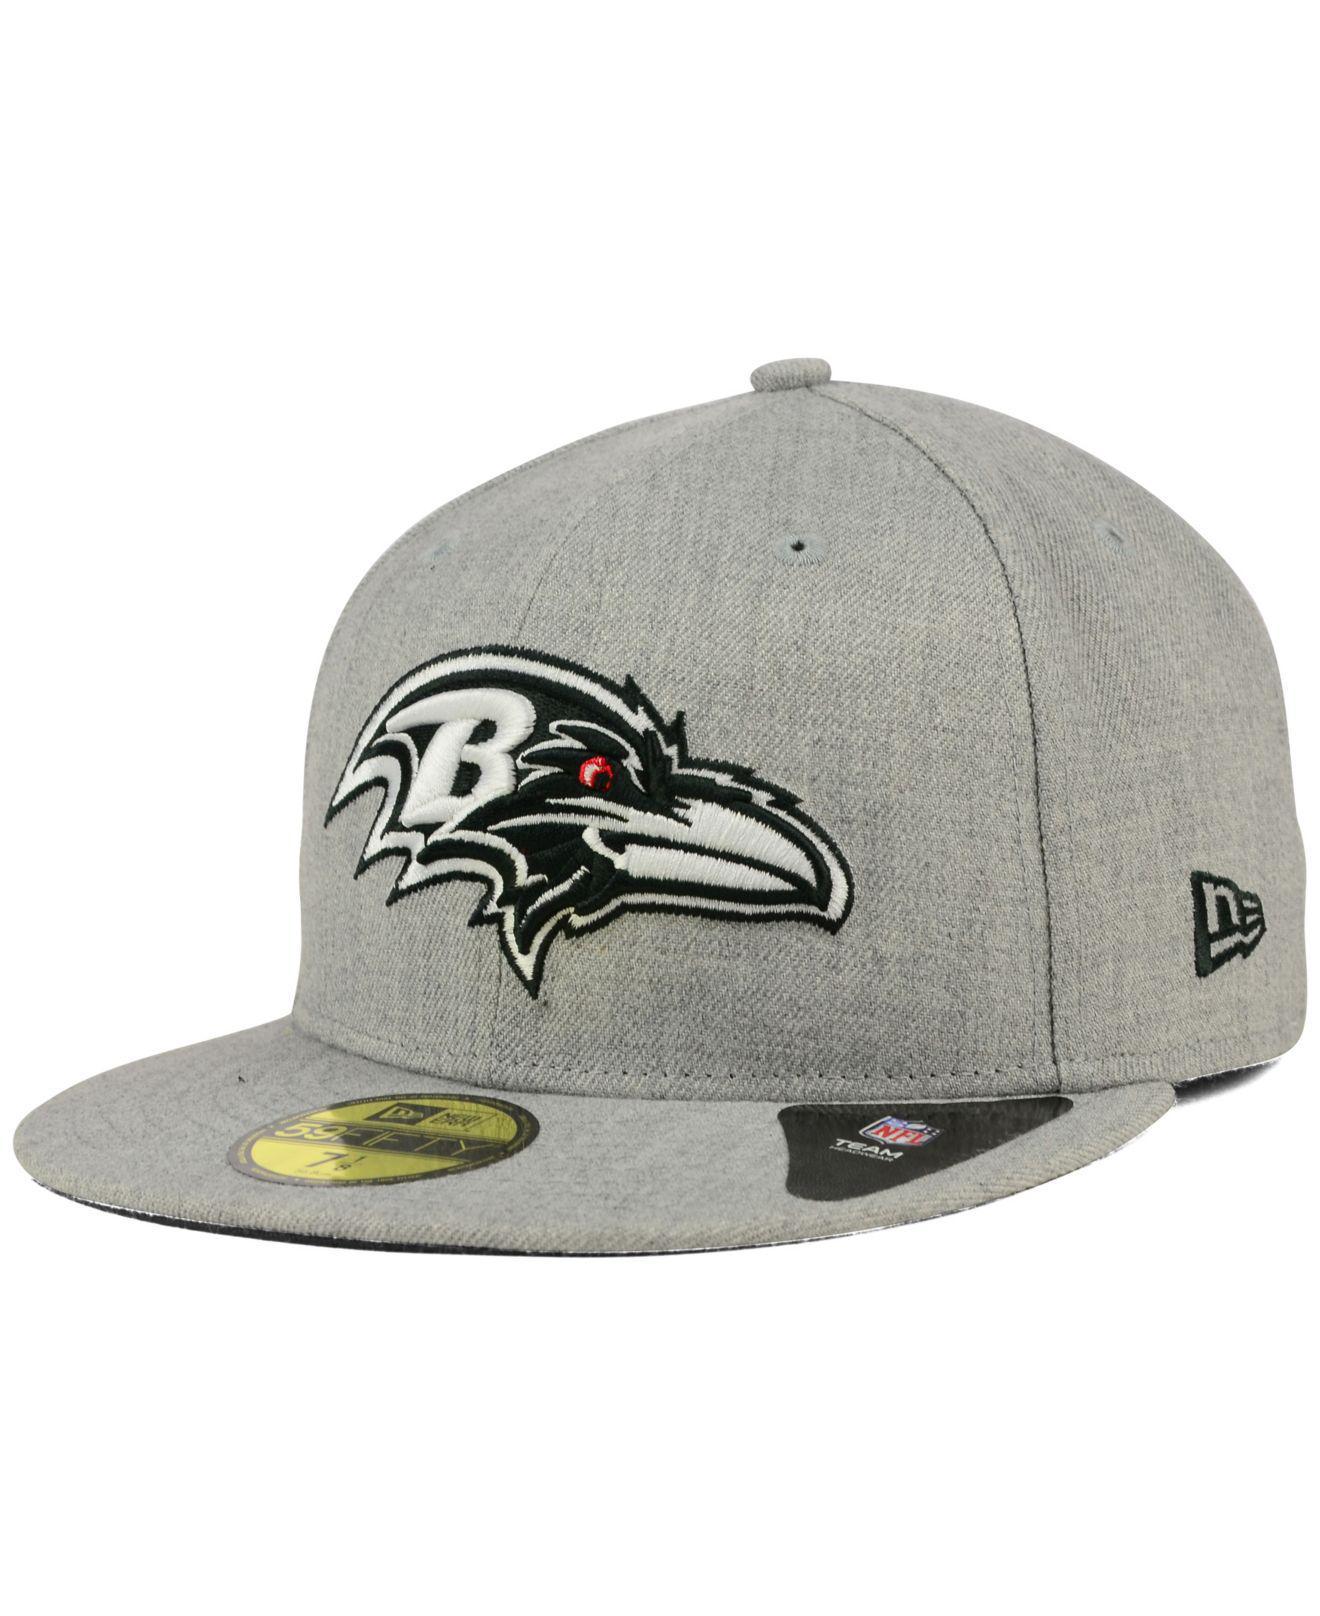 Lyst - KTZ Baltimore Ravens Heather Black White 59fifty Cap in Gray ... a6ef915cdbe6